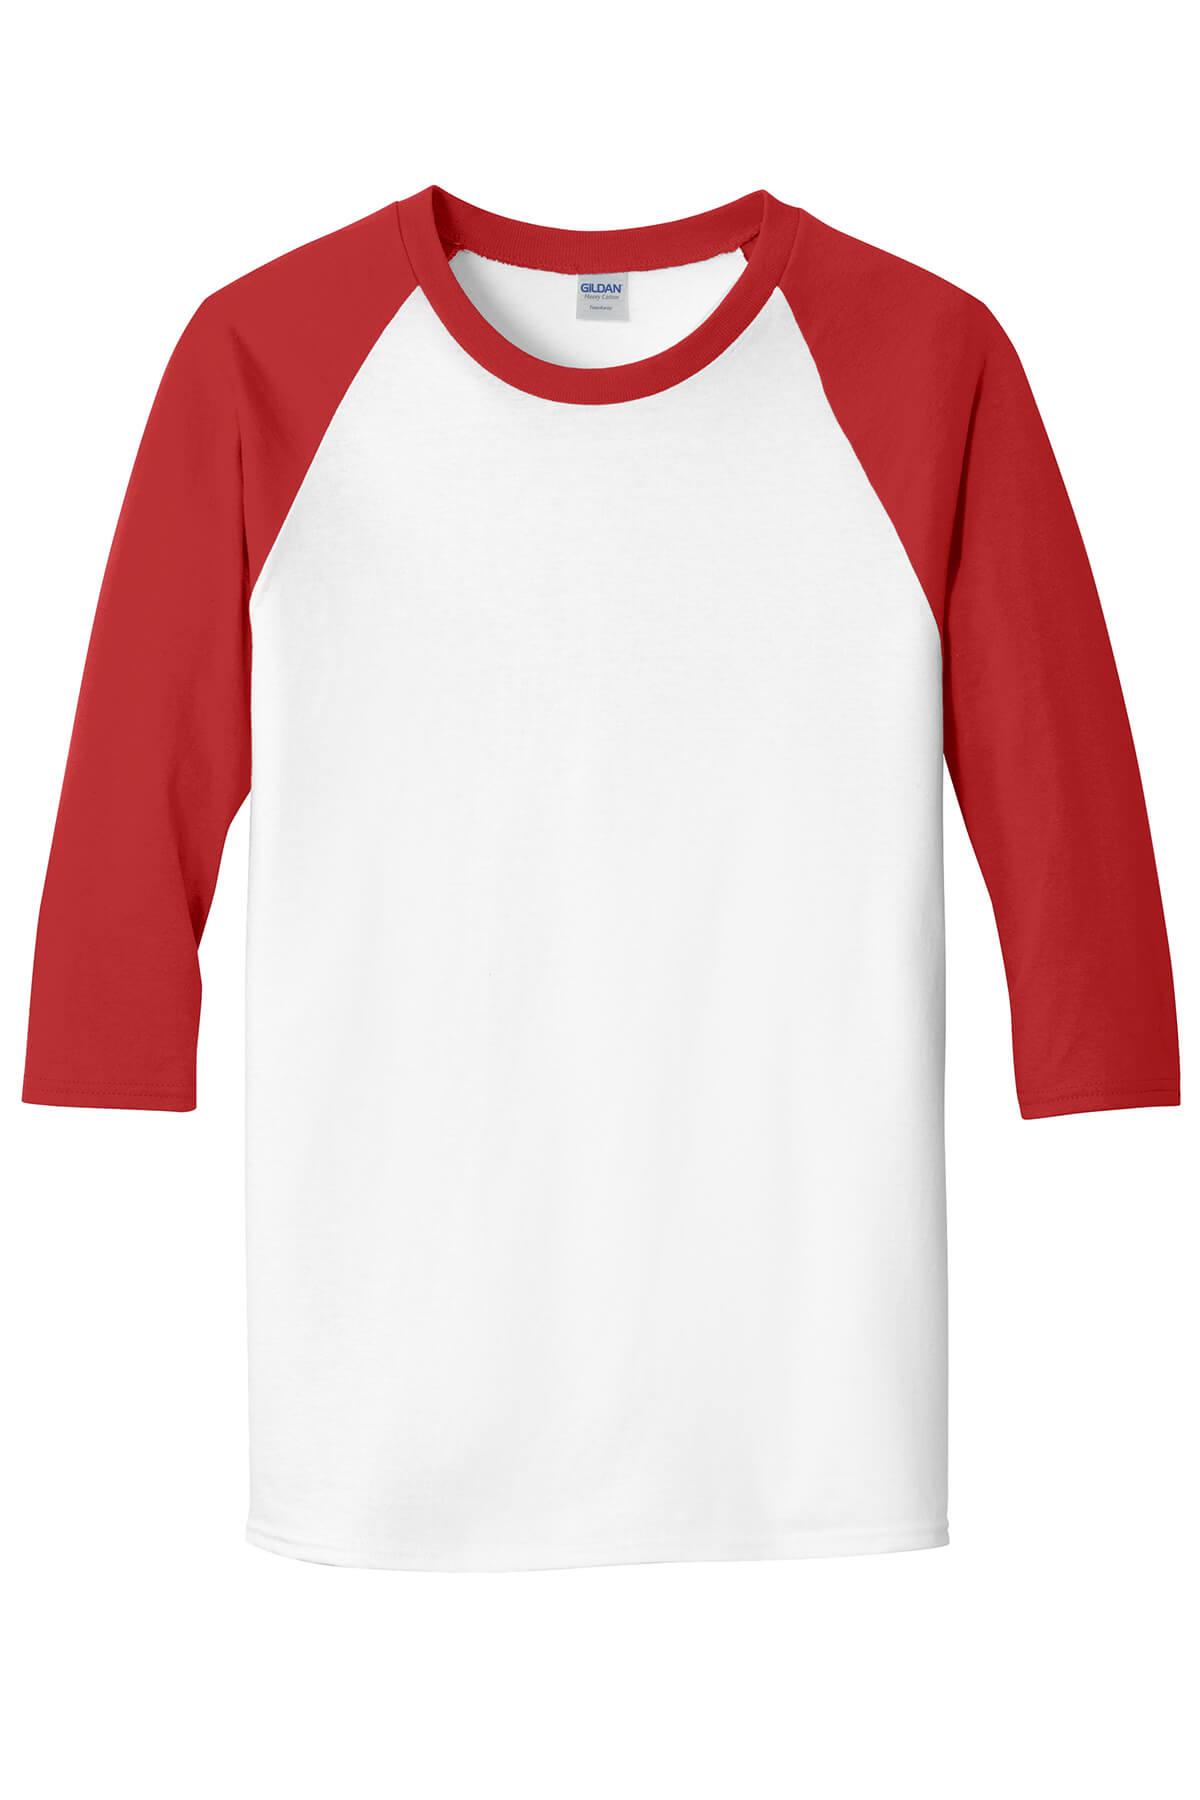 5700-white-red-5